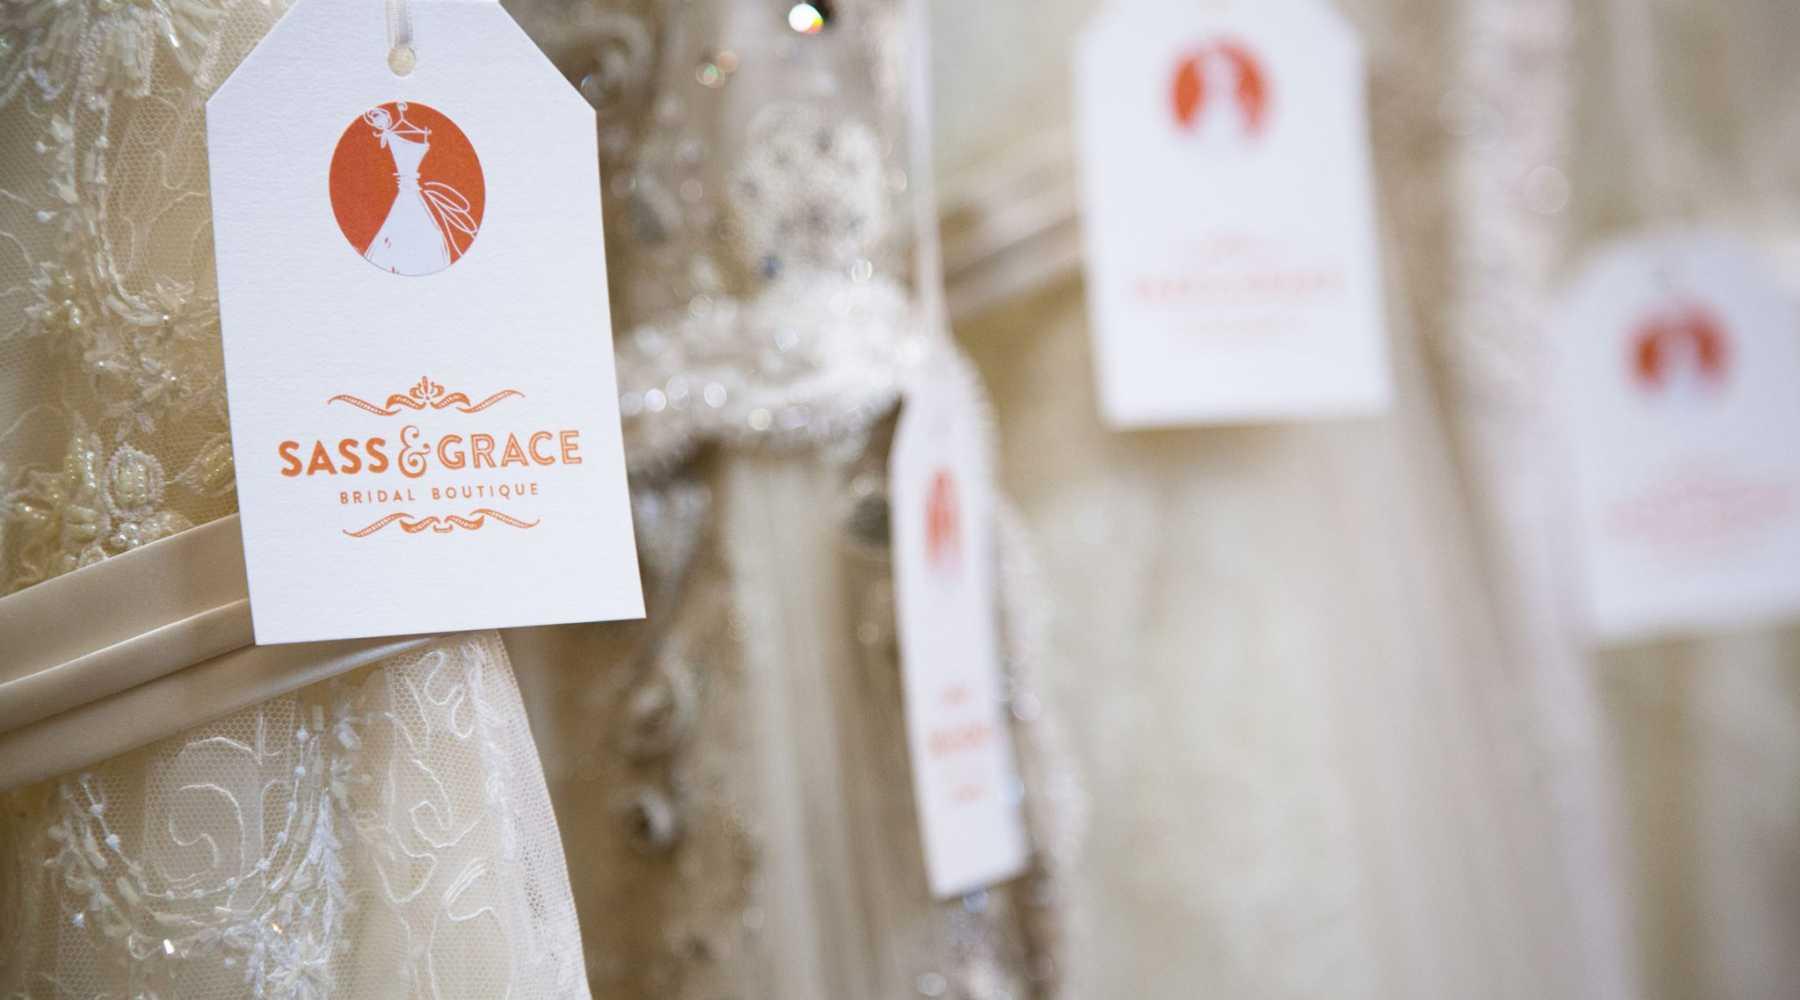 planning a wedding, sass & grace bridal boutique wedding dress winchester hampshire wedding dress tags